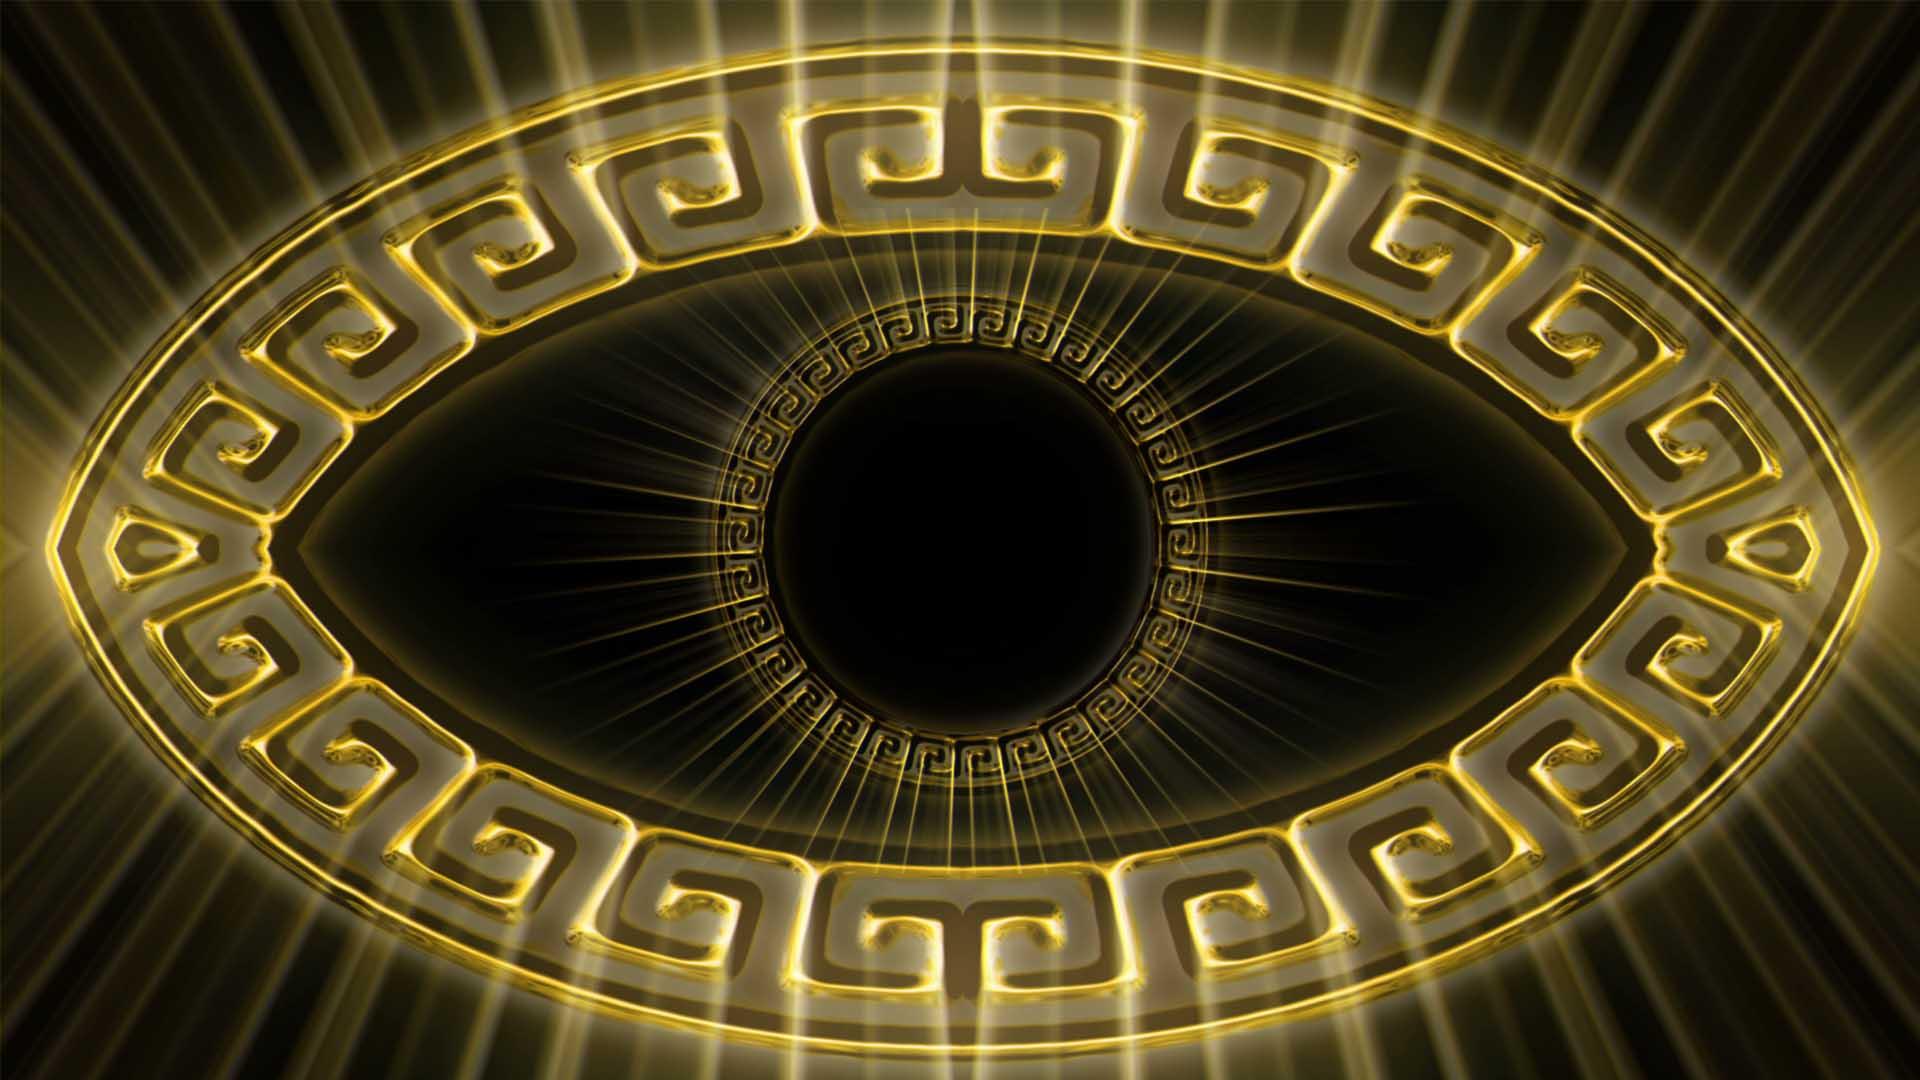 Olympia_Greece_Symbols_Ornament_Gold_Motion_Background_Video_VJ_Loop_HD